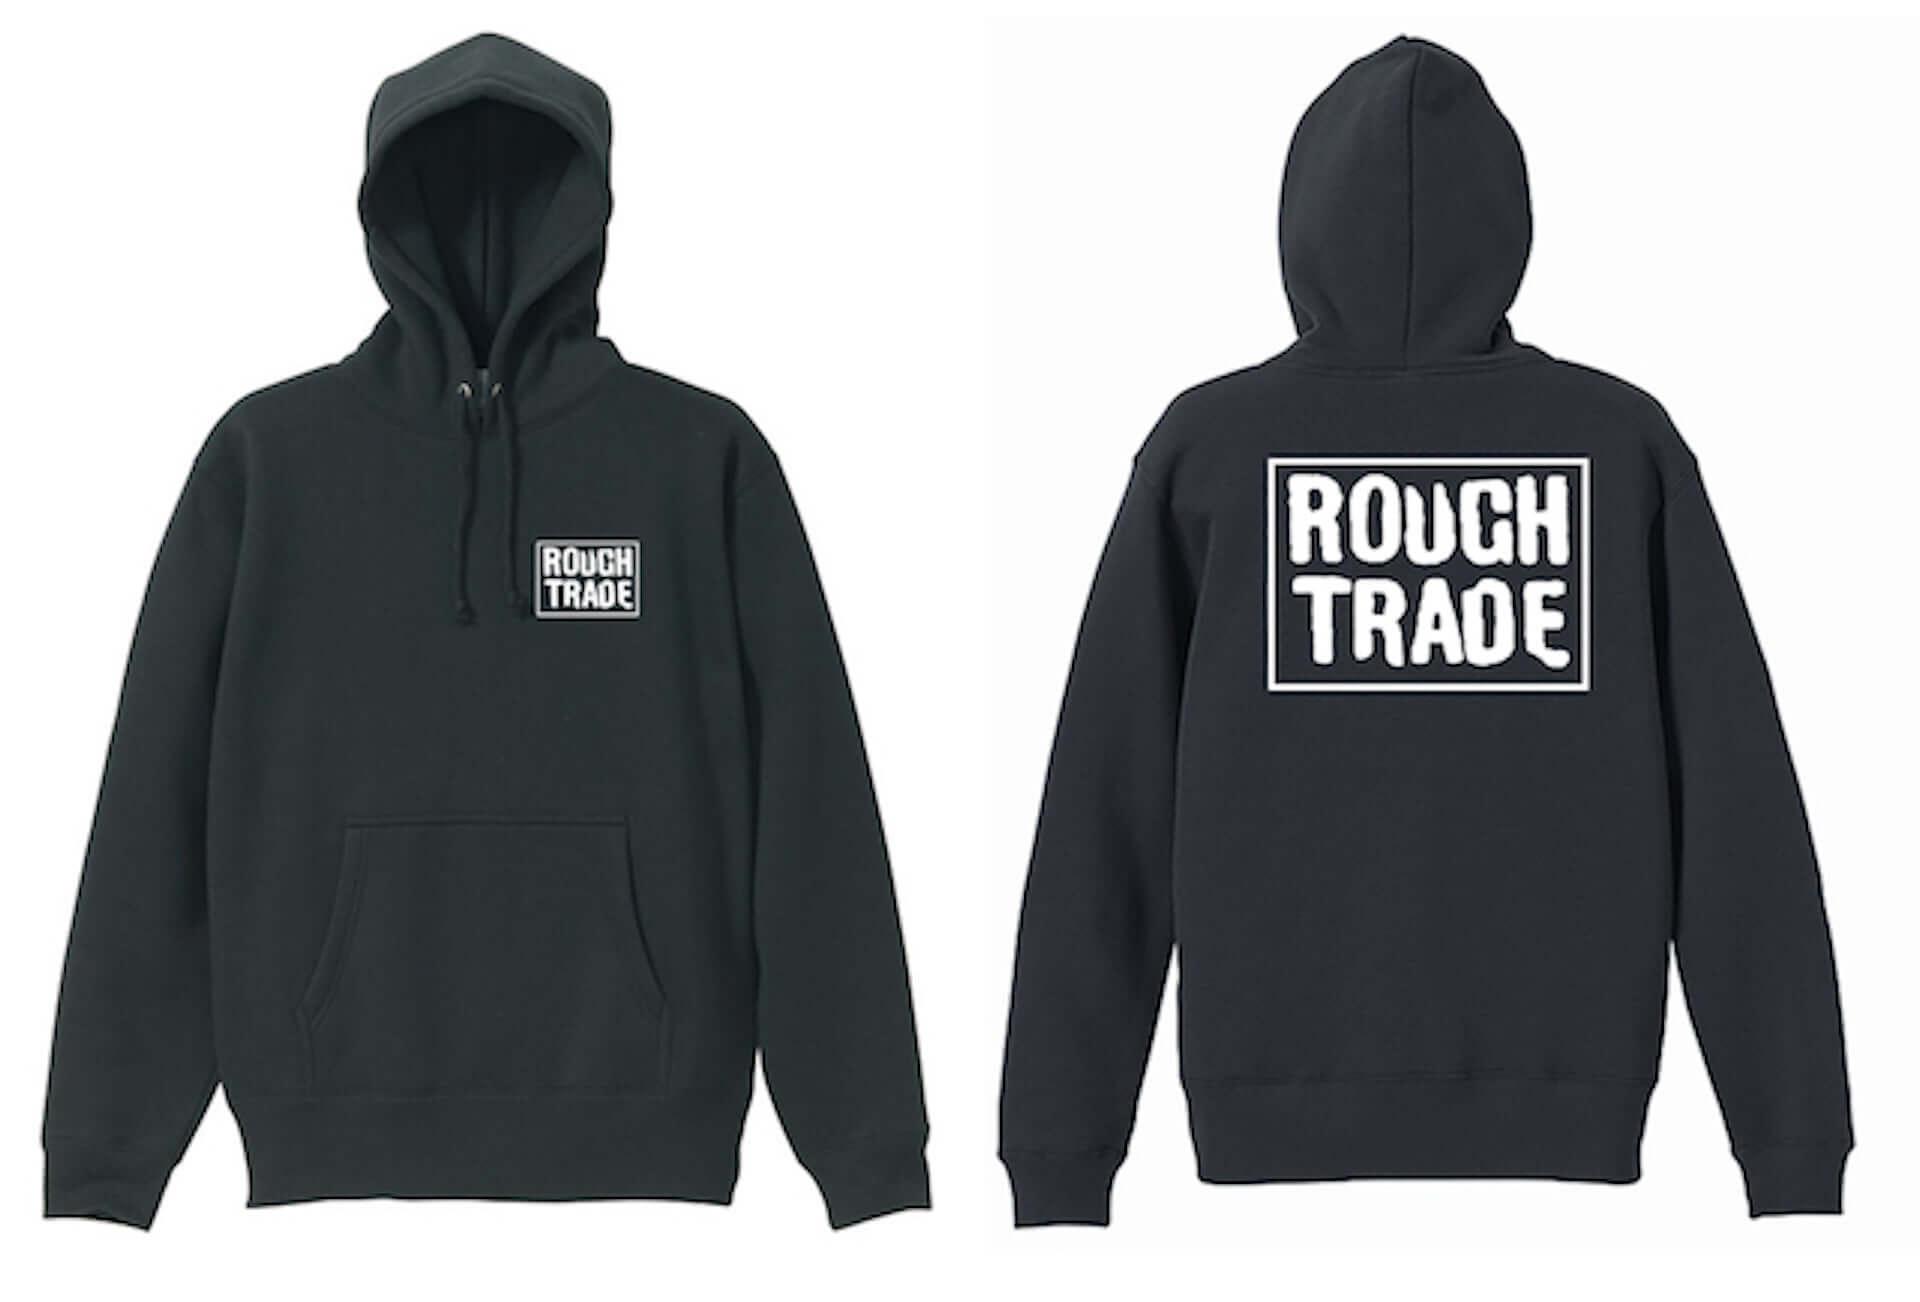 〈Rough Trade Records〉の特別展示が代官山蔦屋書店にて開催決定!ジェフ・トラヴィスが選んだ名盤など展示&新作グッズも販売 music201015_roughtrade-tsite_4-1920x1302